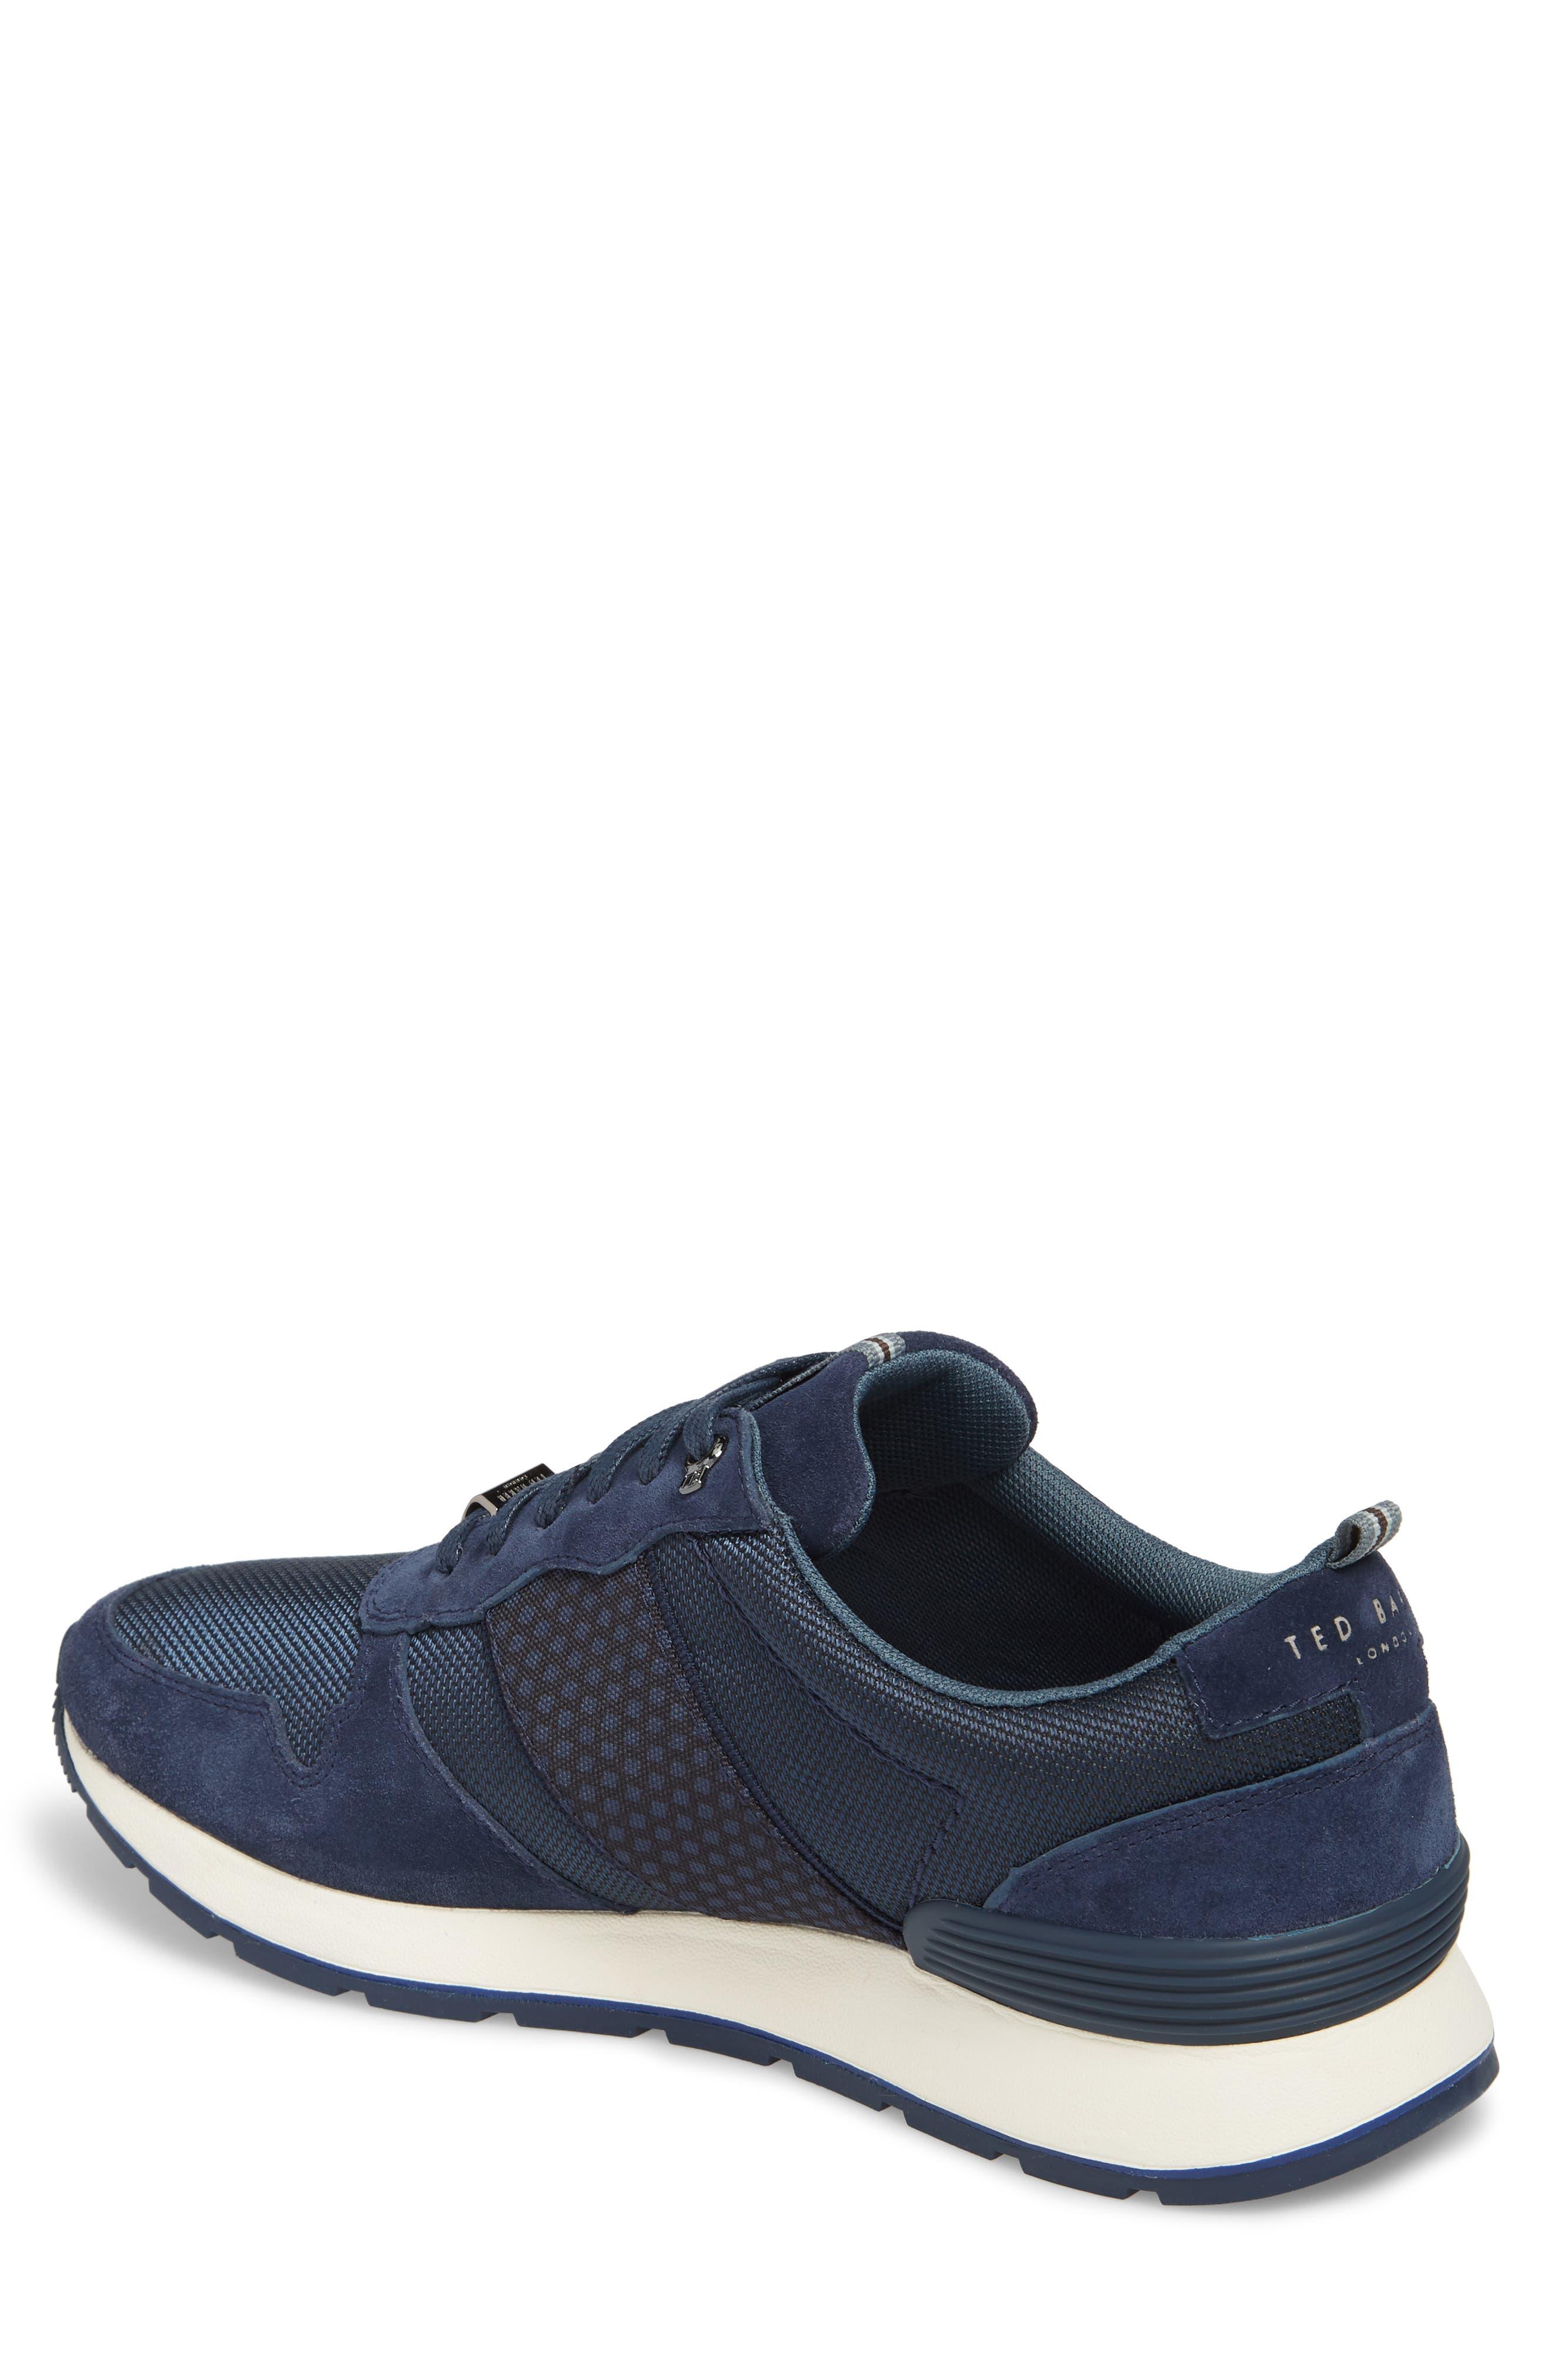 Hebey Lace-Up Sneaker,                             Alternate thumbnail 2, color,                             DARK BLUE TEXTILE